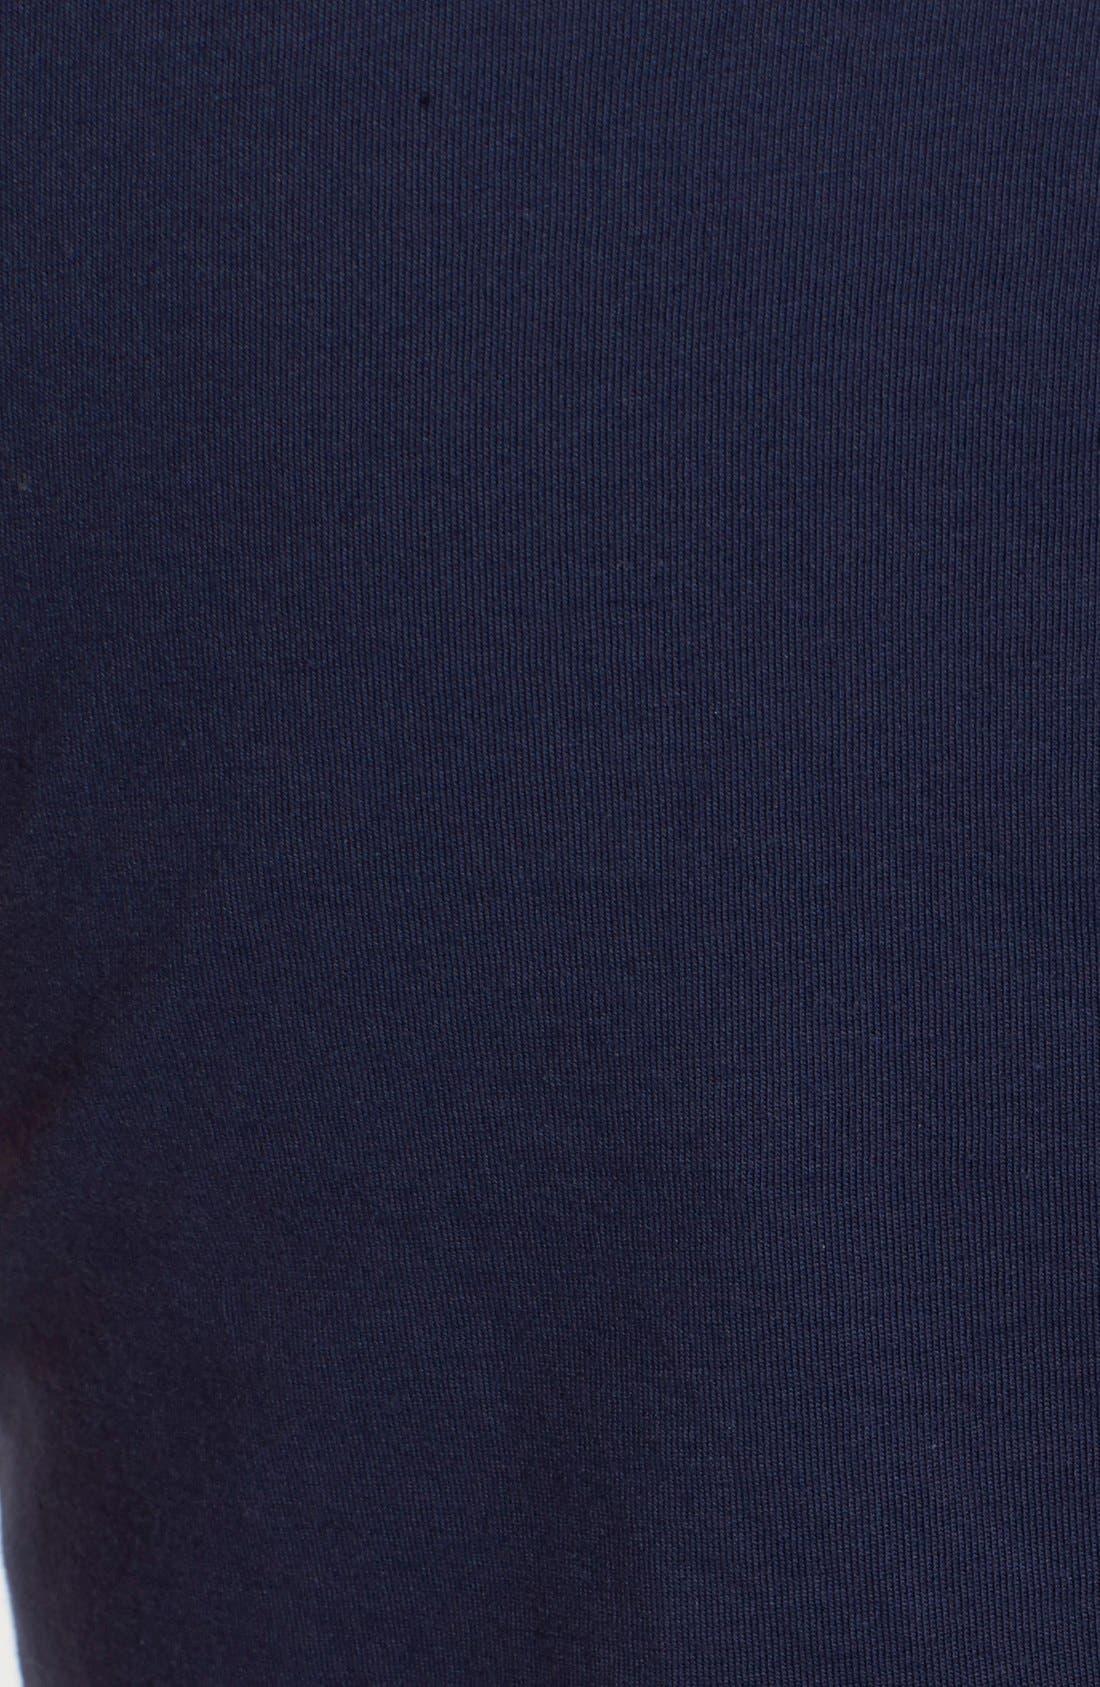 'Brewster' Contrast Trim T-Shirt Dress,                             Alternate thumbnail 7, color,                             TRUE NAVY